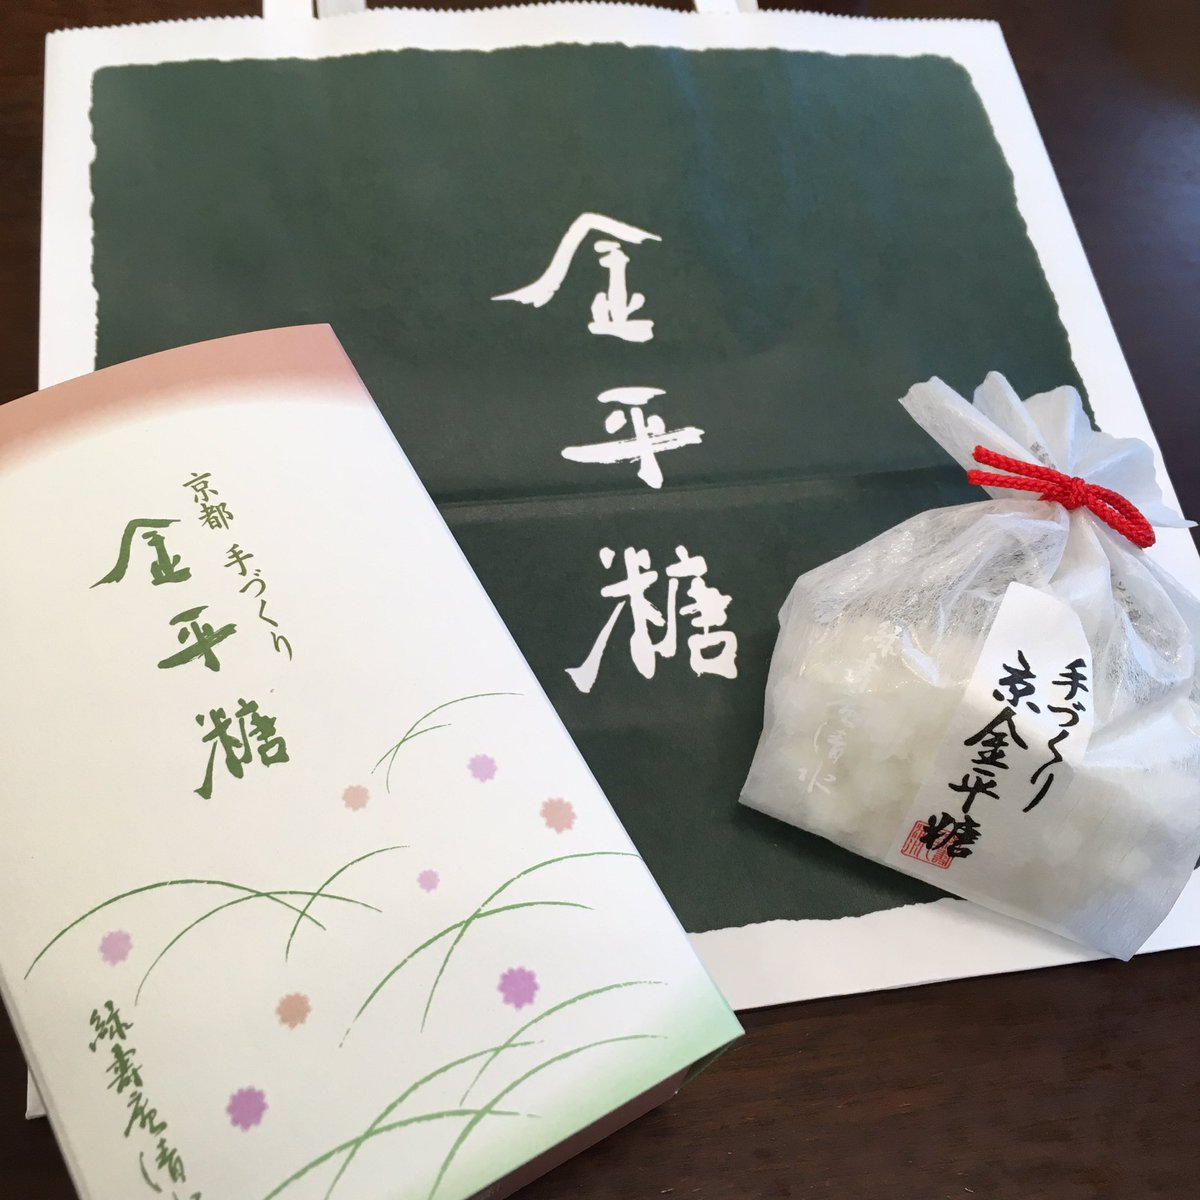 test ツイッターメディア - #今日のおやつ 緑寿庵清水さんの金平糖!  日本で唯一の金平糖専門店。「2週間」かけて作られる金平糖は味がギュッと凝縮されています。食べた人は「金平糖の概念が変わった」とも……是非一度食べてみてください☺️ https://t.co/Lpu2MH515r https://t.co/IkZ5Z817Oa